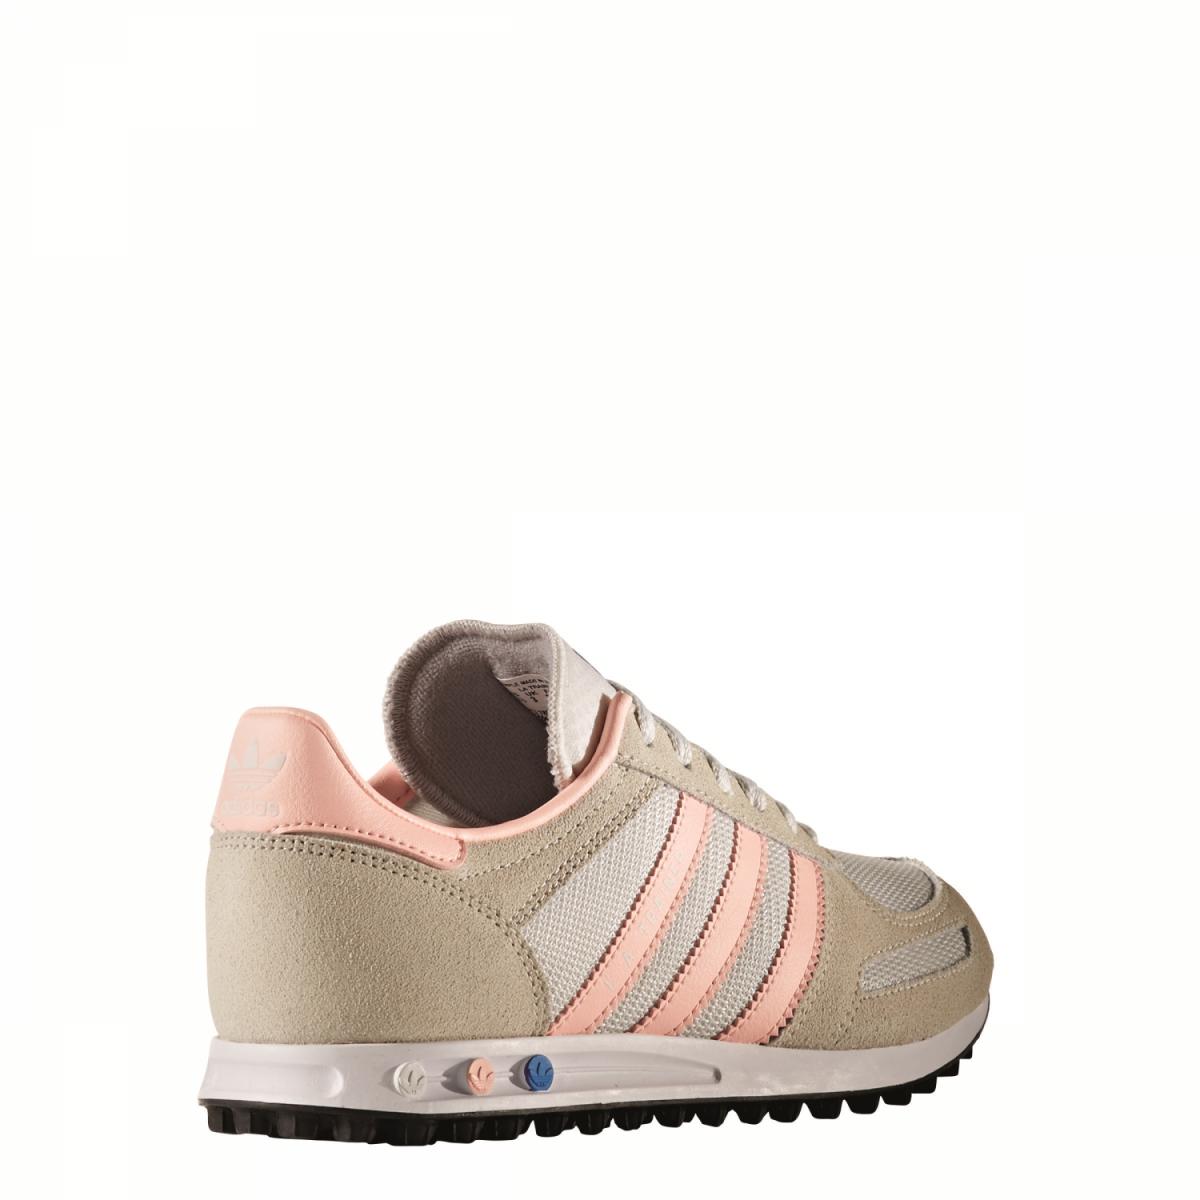 adidas originals la trainer sneaker schuhe beige rosa. Black Bedroom Furniture Sets. Home Design Ideas